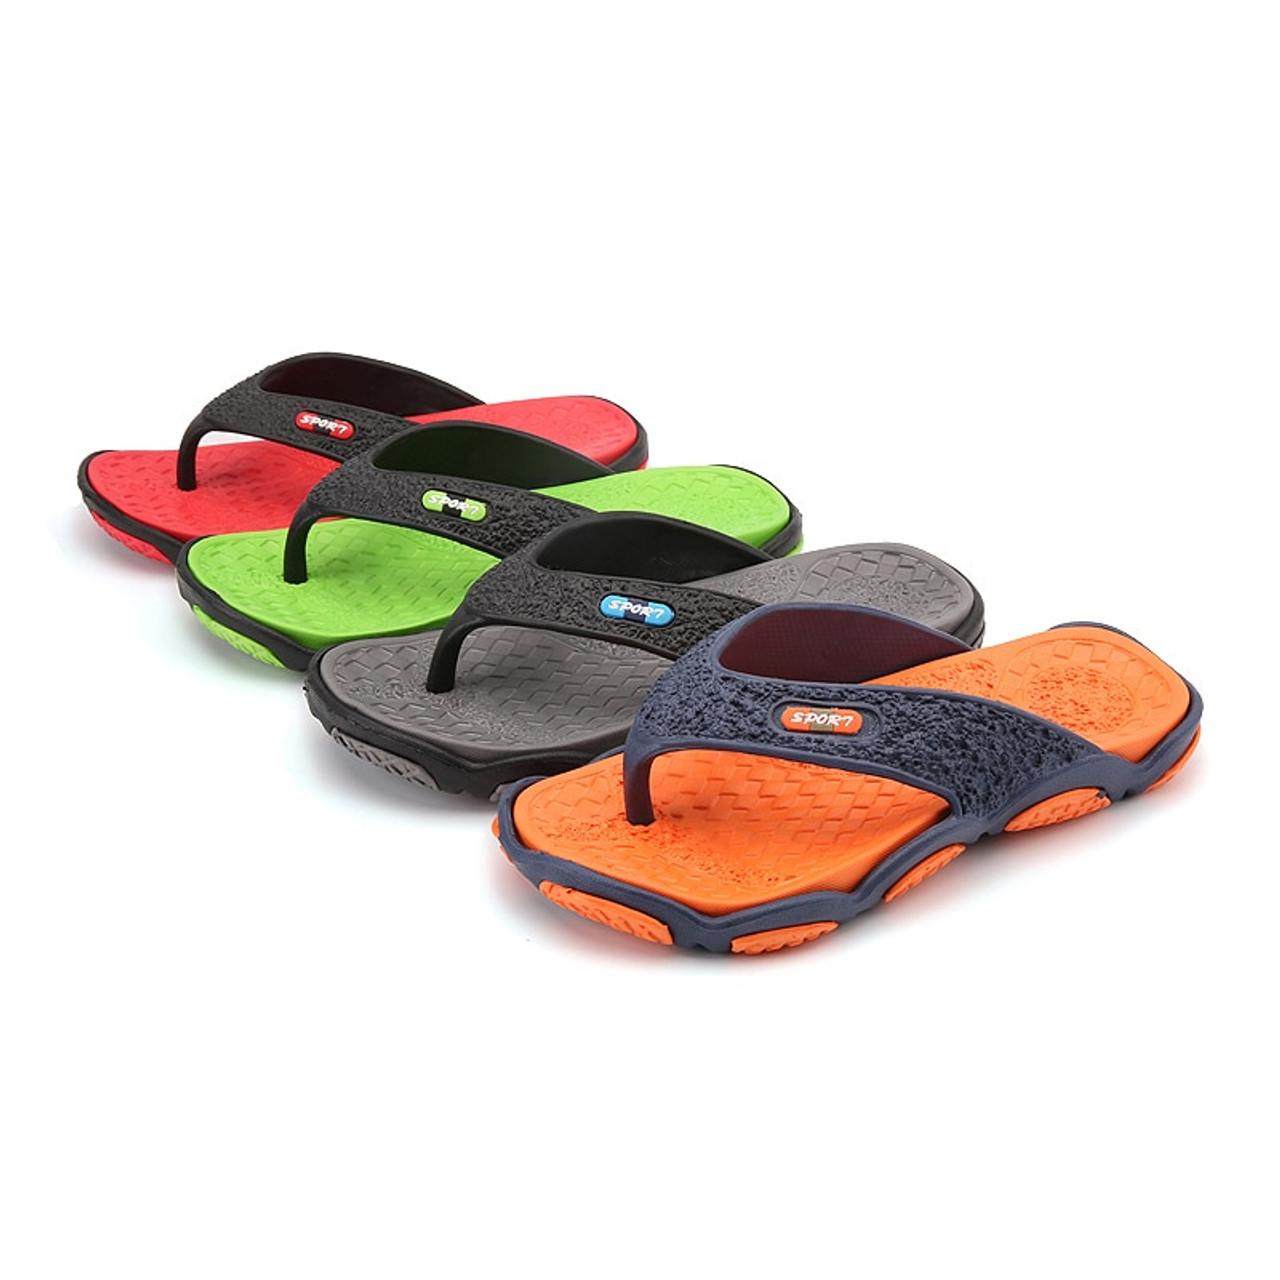 568c7b5af70513 ... CcharmiX Mens Flip Flops Summer Men s New Style Rubber Soft Shoes  Outdoor Beach Men s Slippers Massage ...